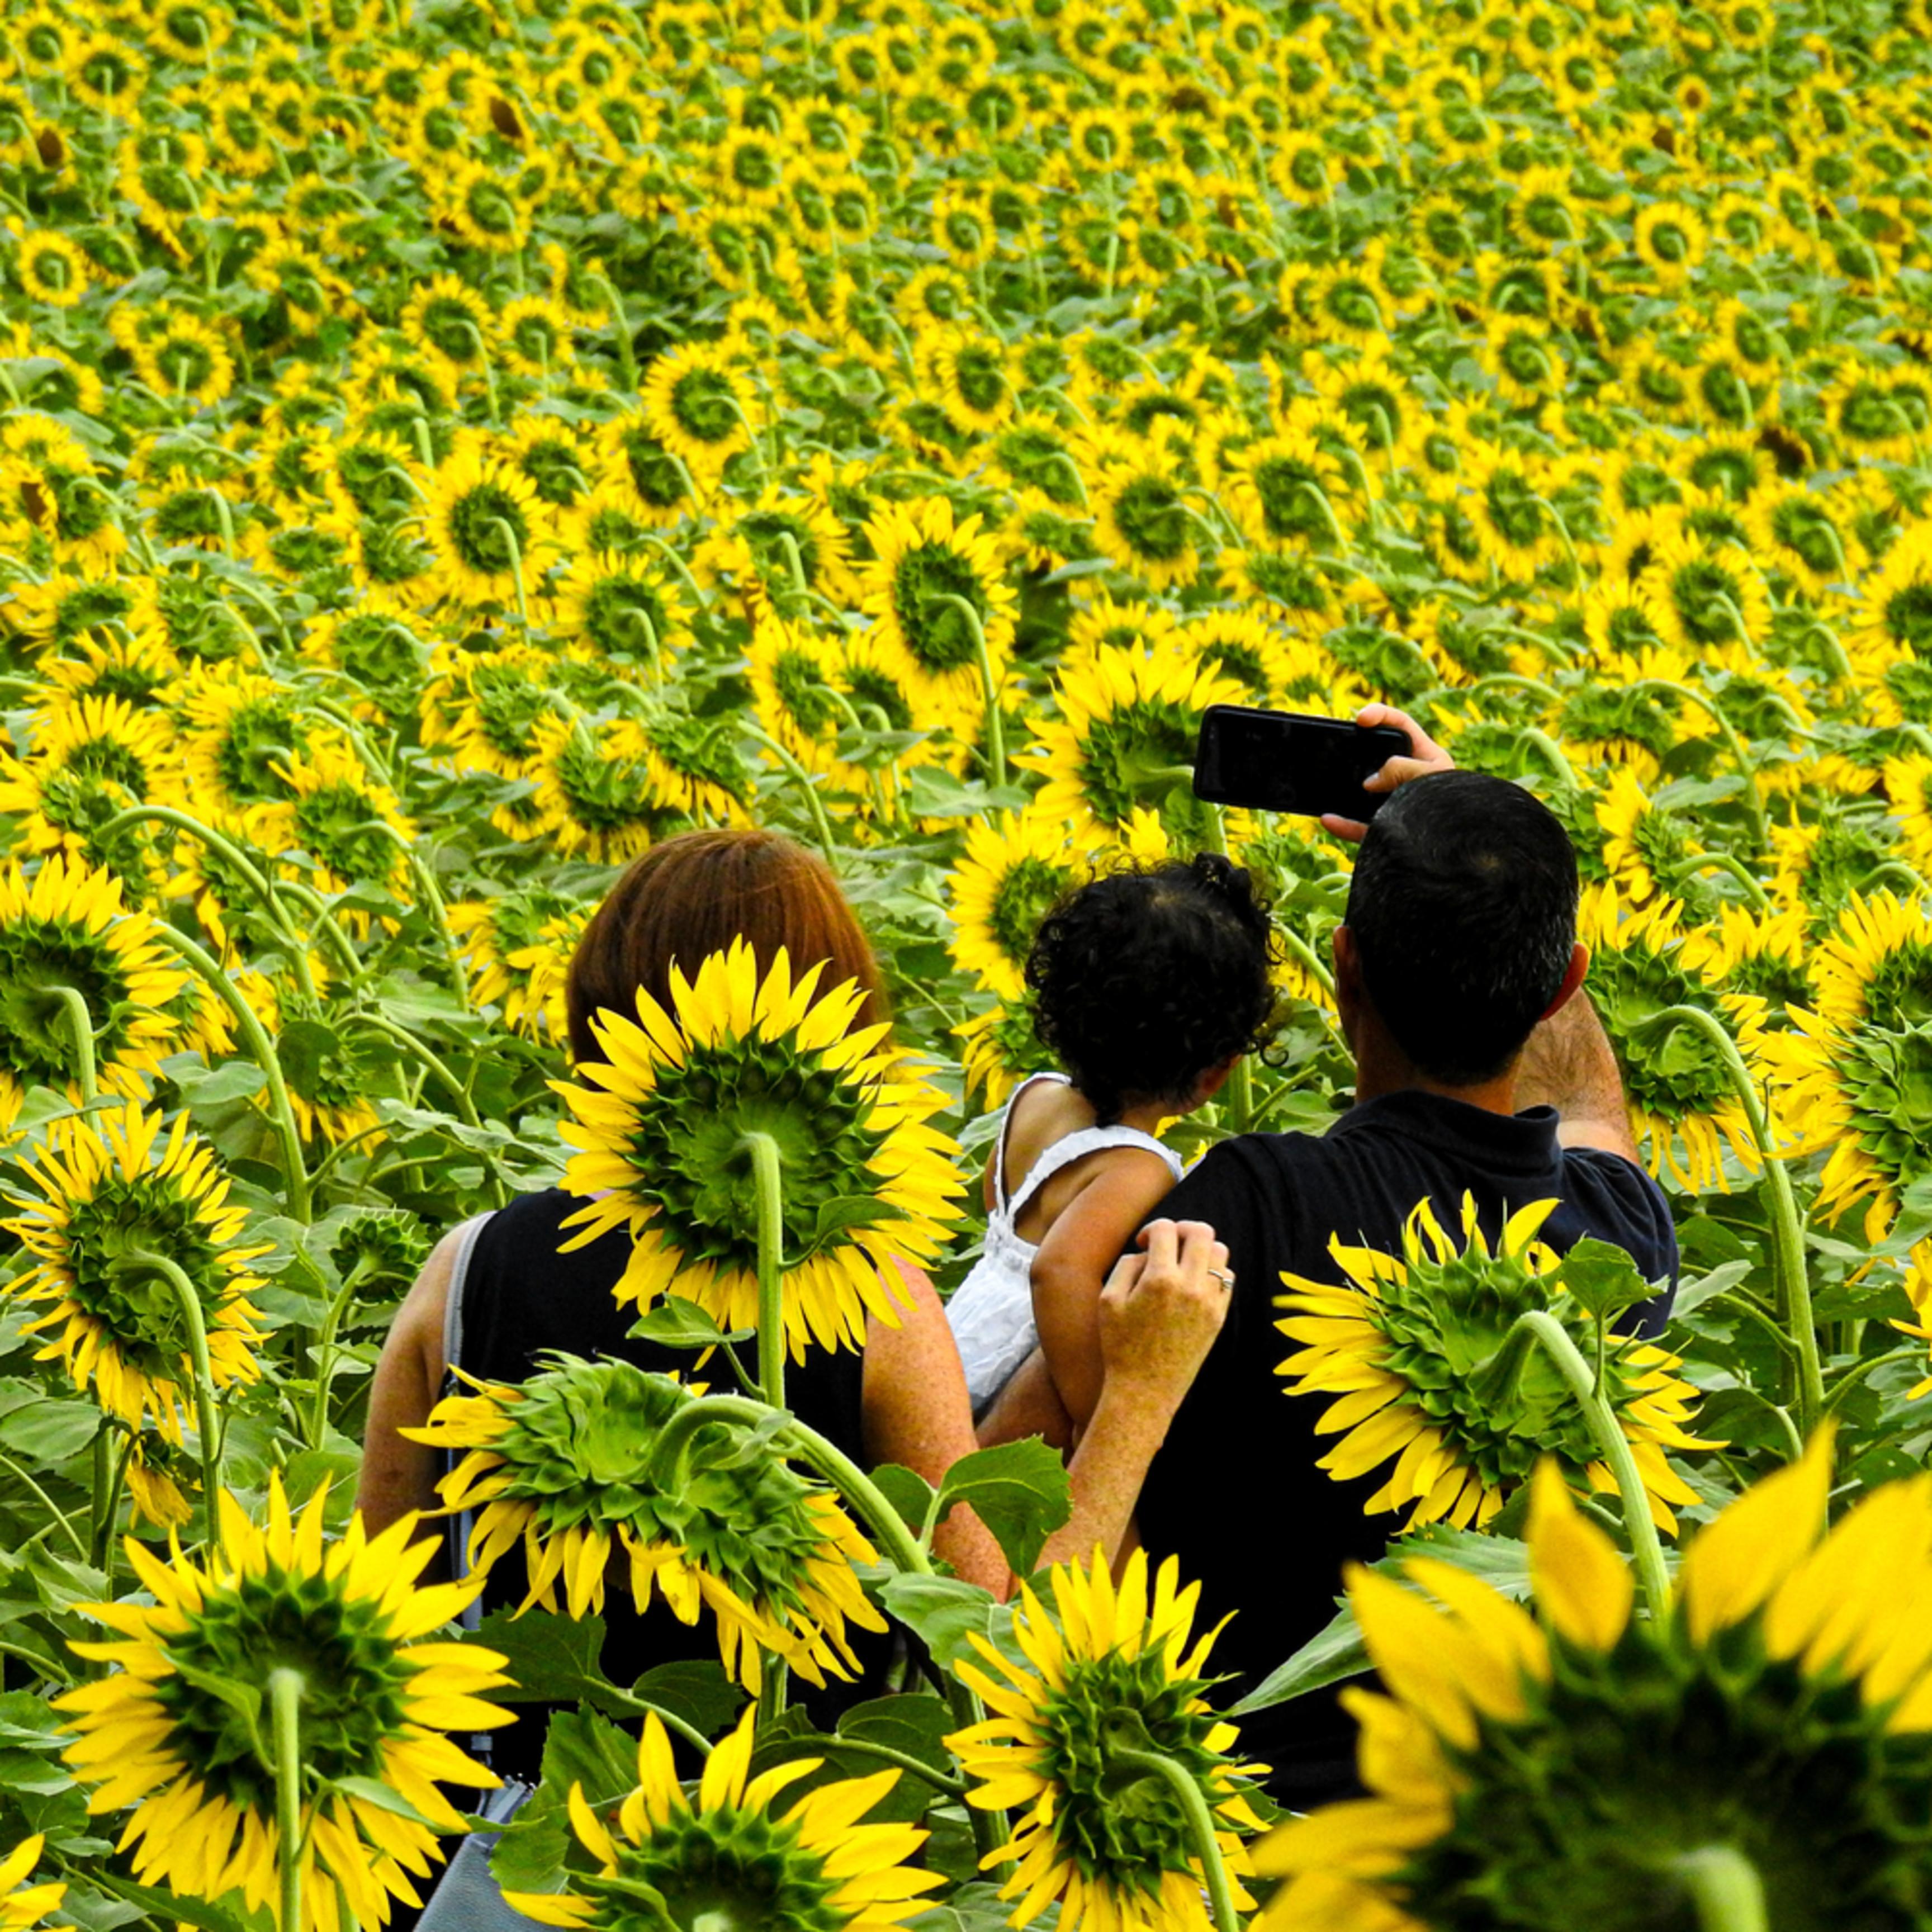 Sunflower ybkysb